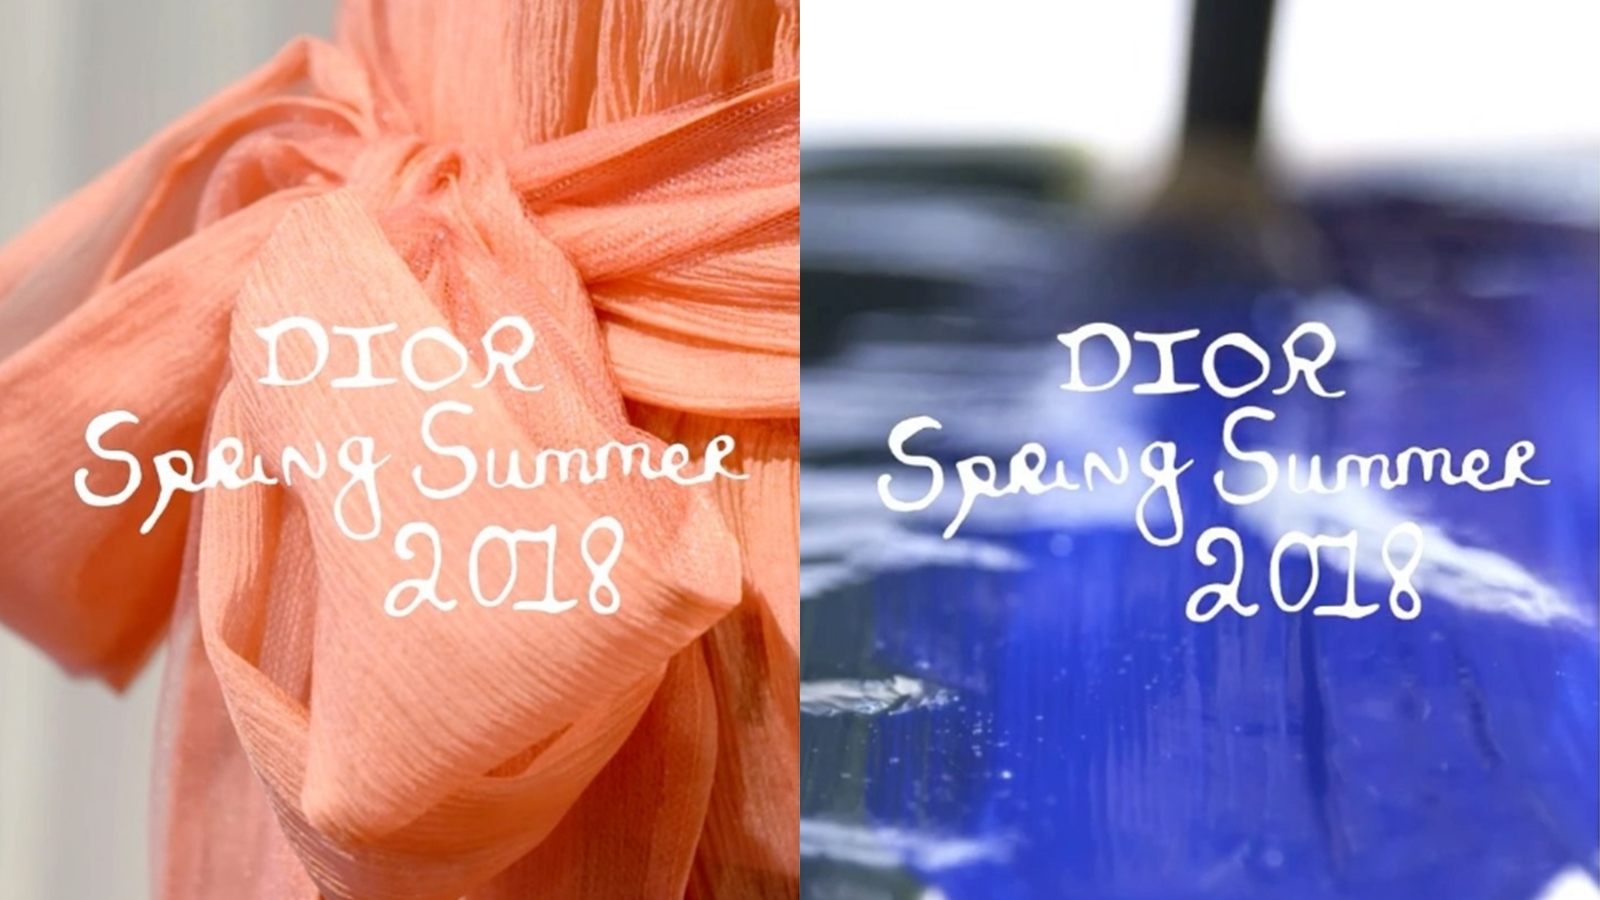 Livestream show diễn Xuân Hè 2018 của Dior từ Paris